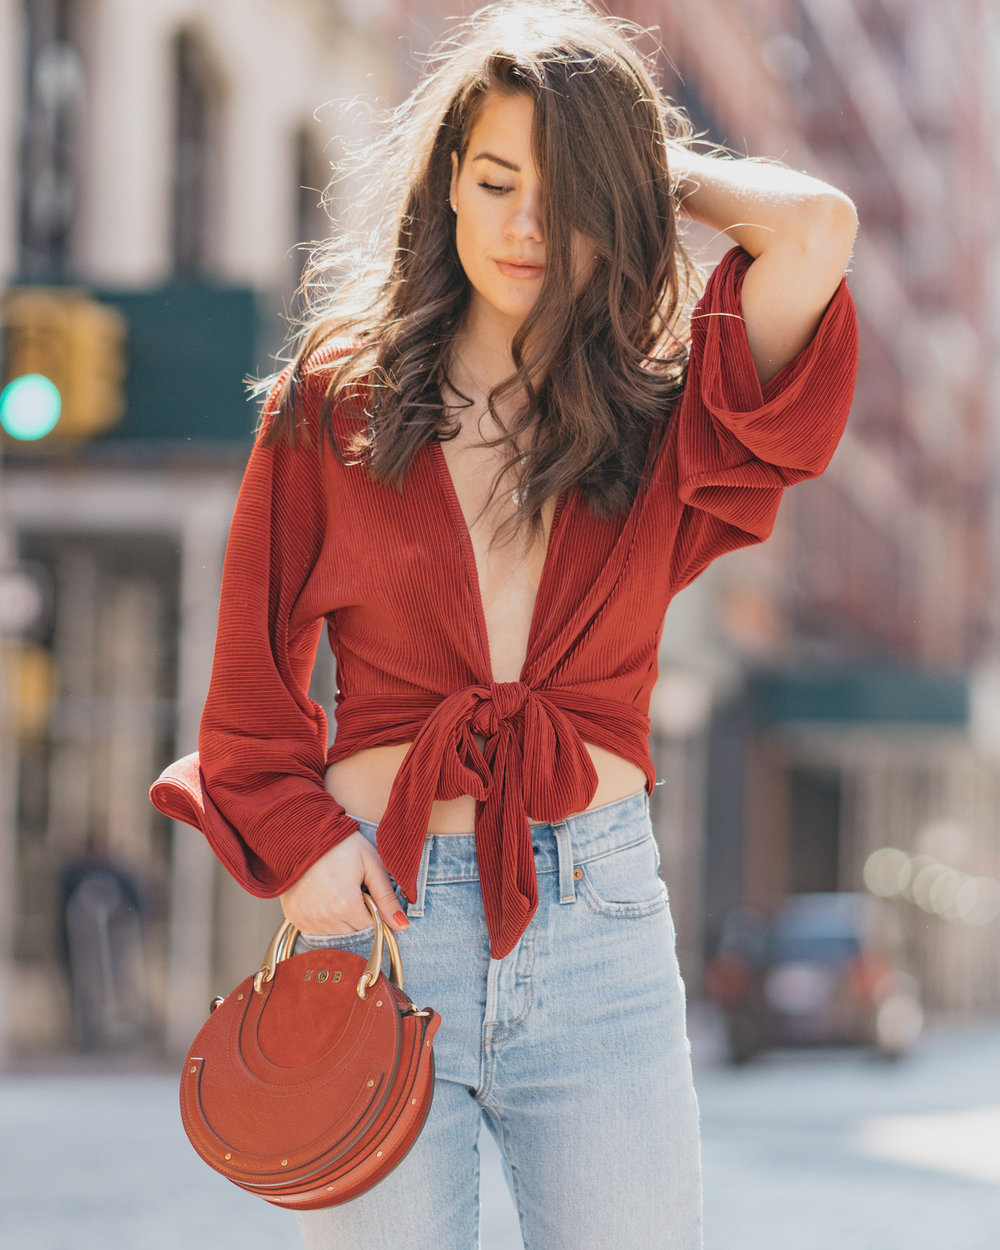 Red-Kimono-Tie-Front-Top-Ruby-Chloe-Pixie-Leather-Crossbody-Bag-15.jpg